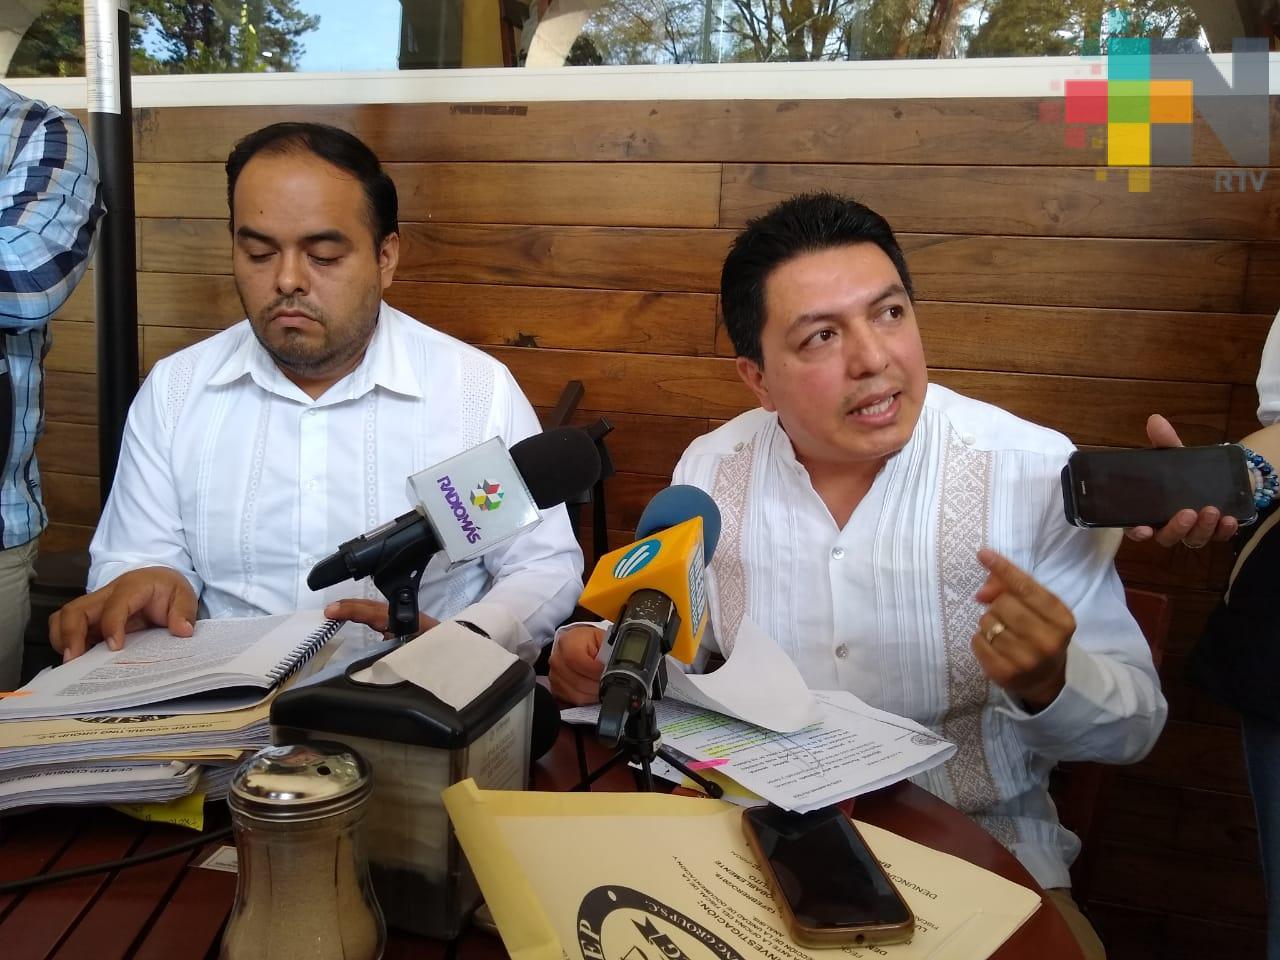 Pedirán intervención de Corte Interamericana de Derechos Humanos para lograr destitución de Jorge Winckler